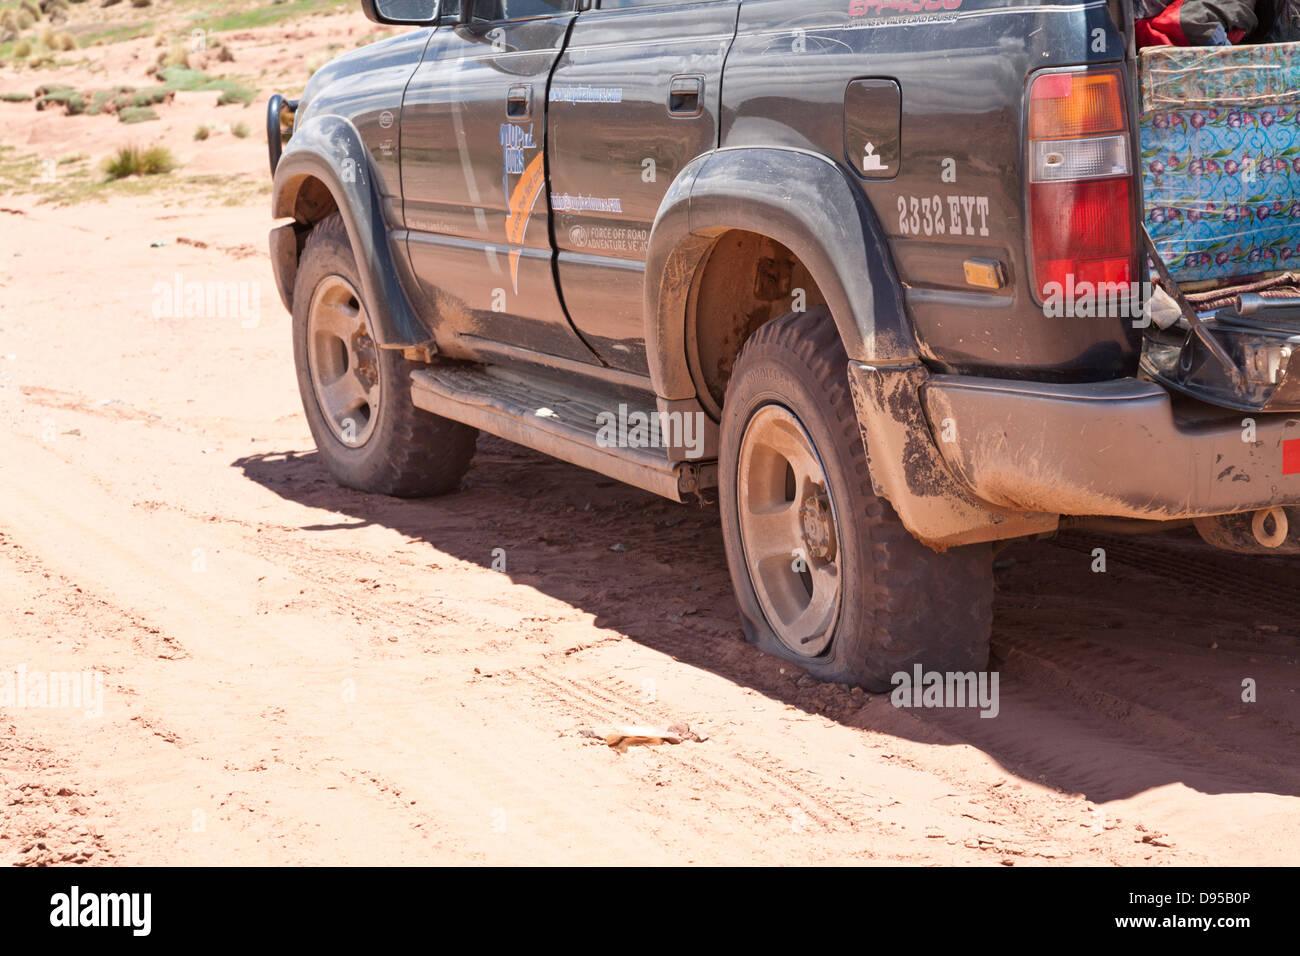 Puncture, Salt Flat Tours, Altiplano, Southwest Bolivia Stock Photo